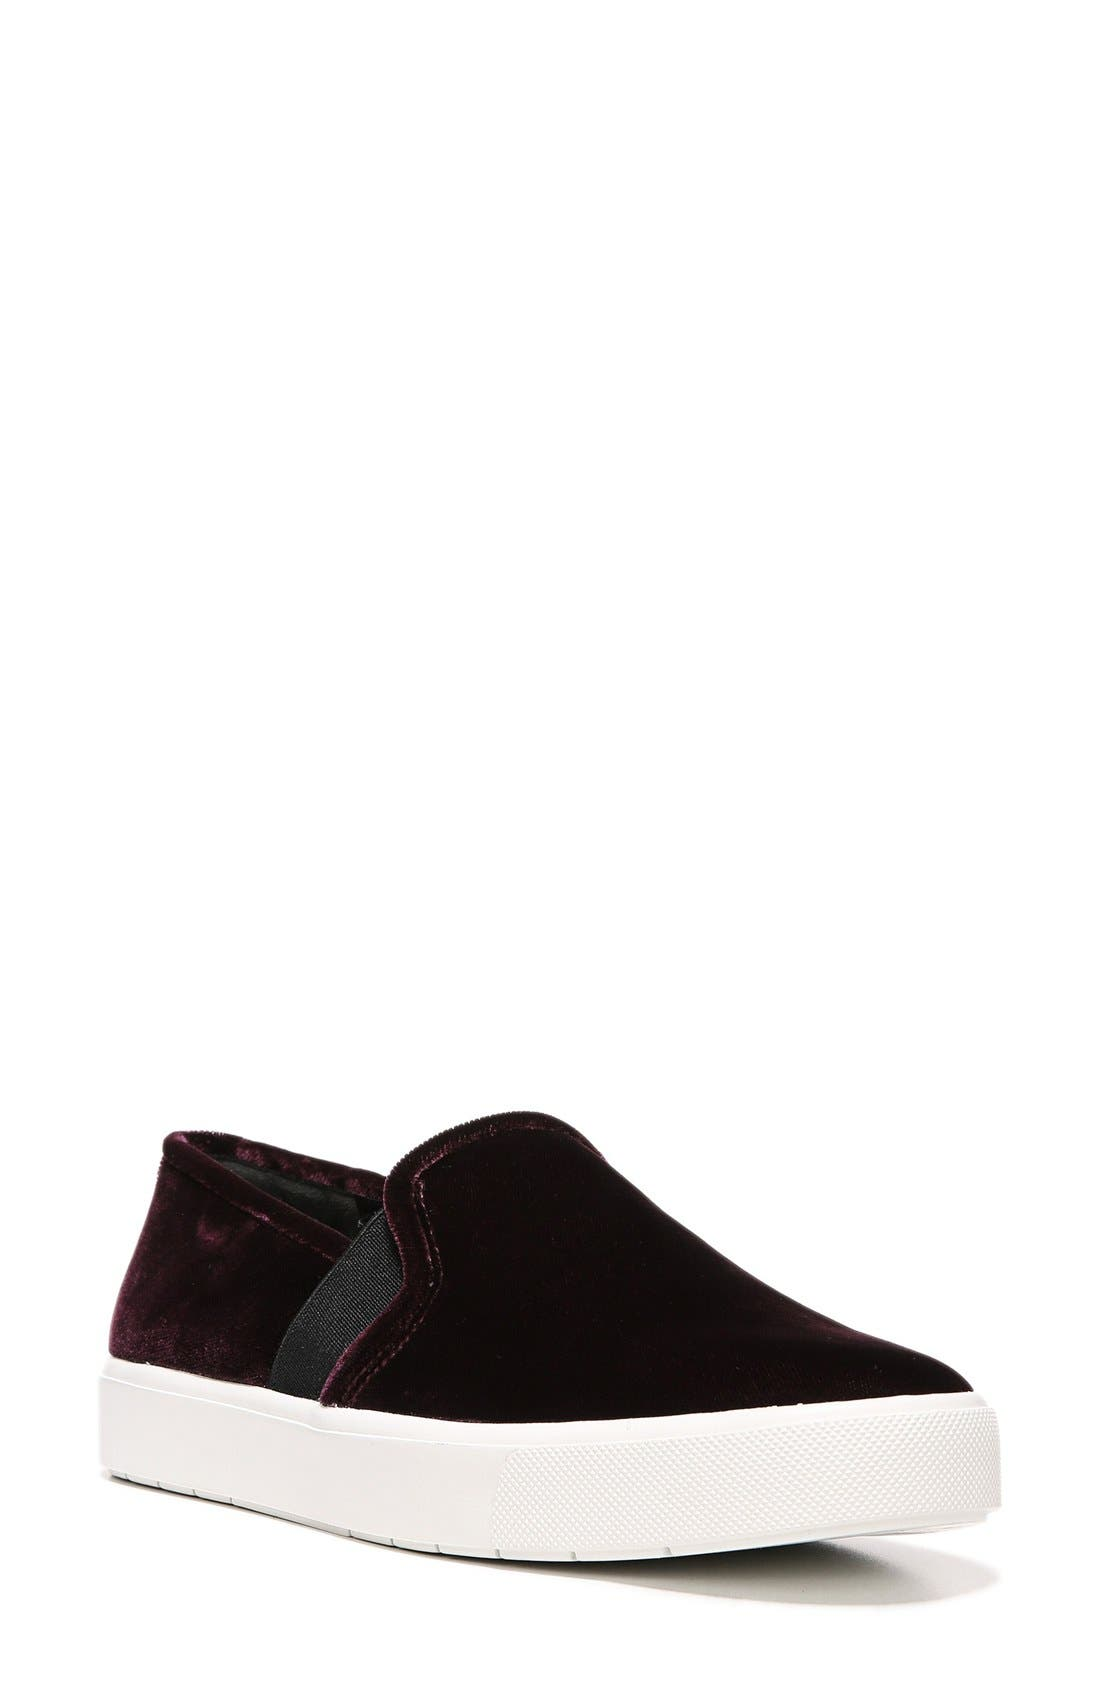 'Blair 12' Slip-On Sneaker,                         Main,                         color, Oxblood